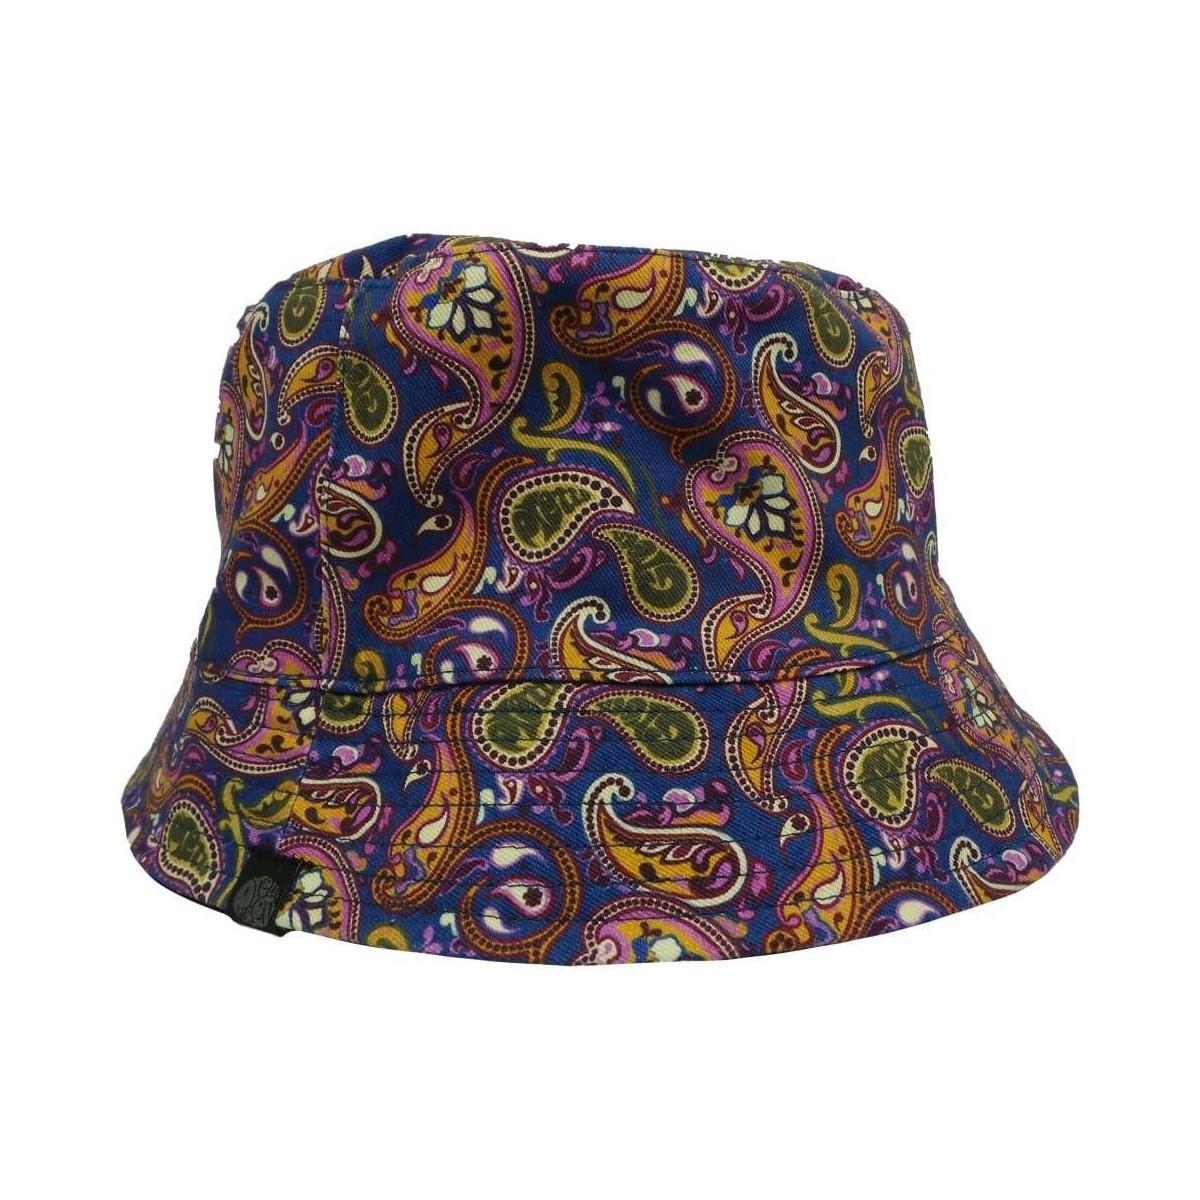 371fed0ce4c706 Pretty Green Reversible Paisley Print Bucket Hat Men's Hat In Blue ...